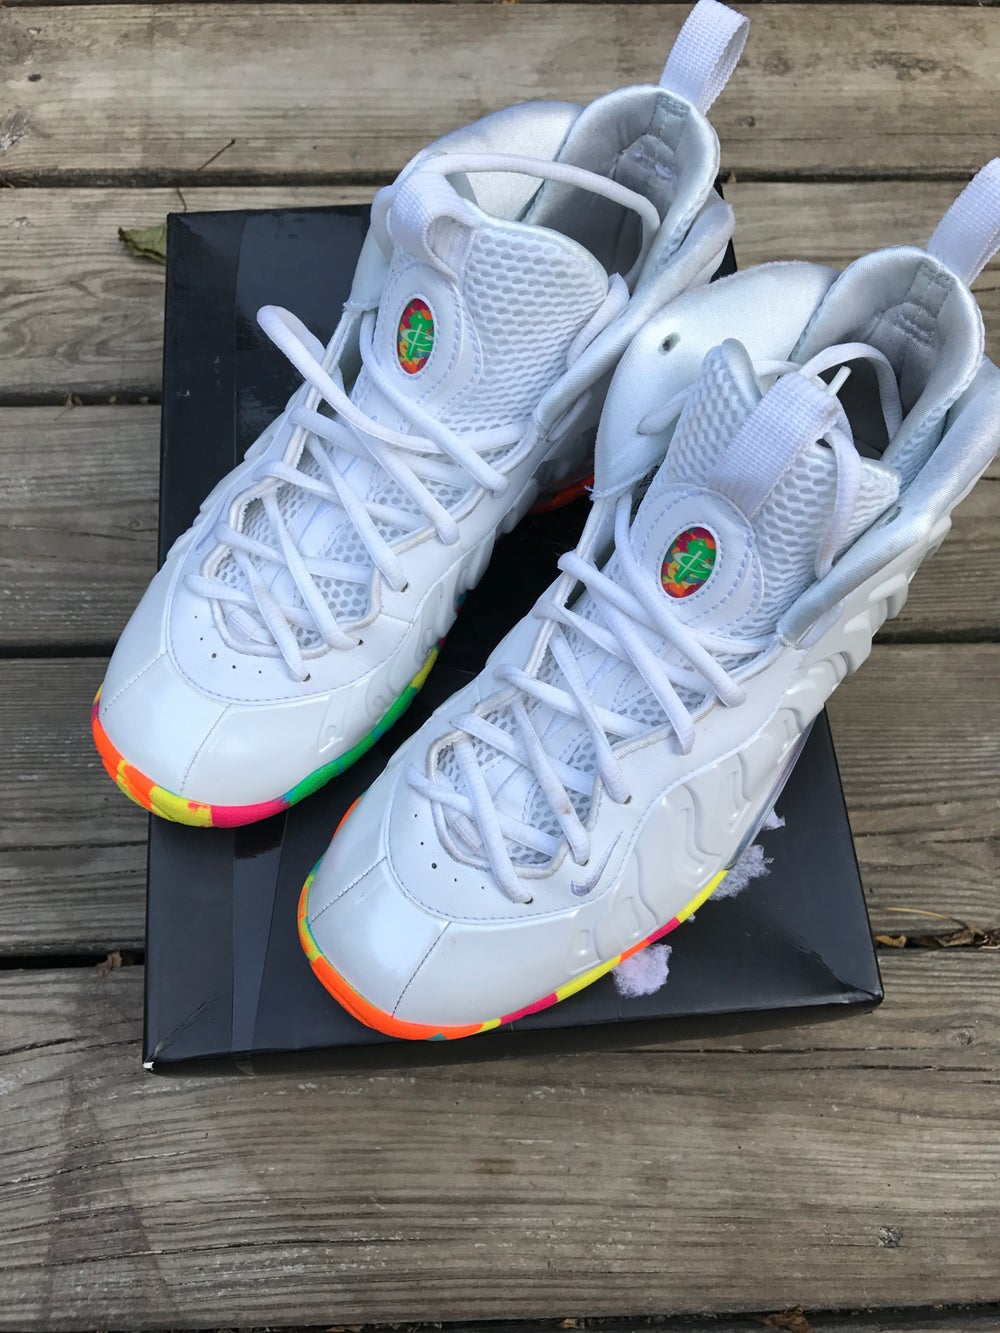 3e2a3b157c4ec ... Release Tomorrow Nike Little Posite One (Fruity Pebbles) ...